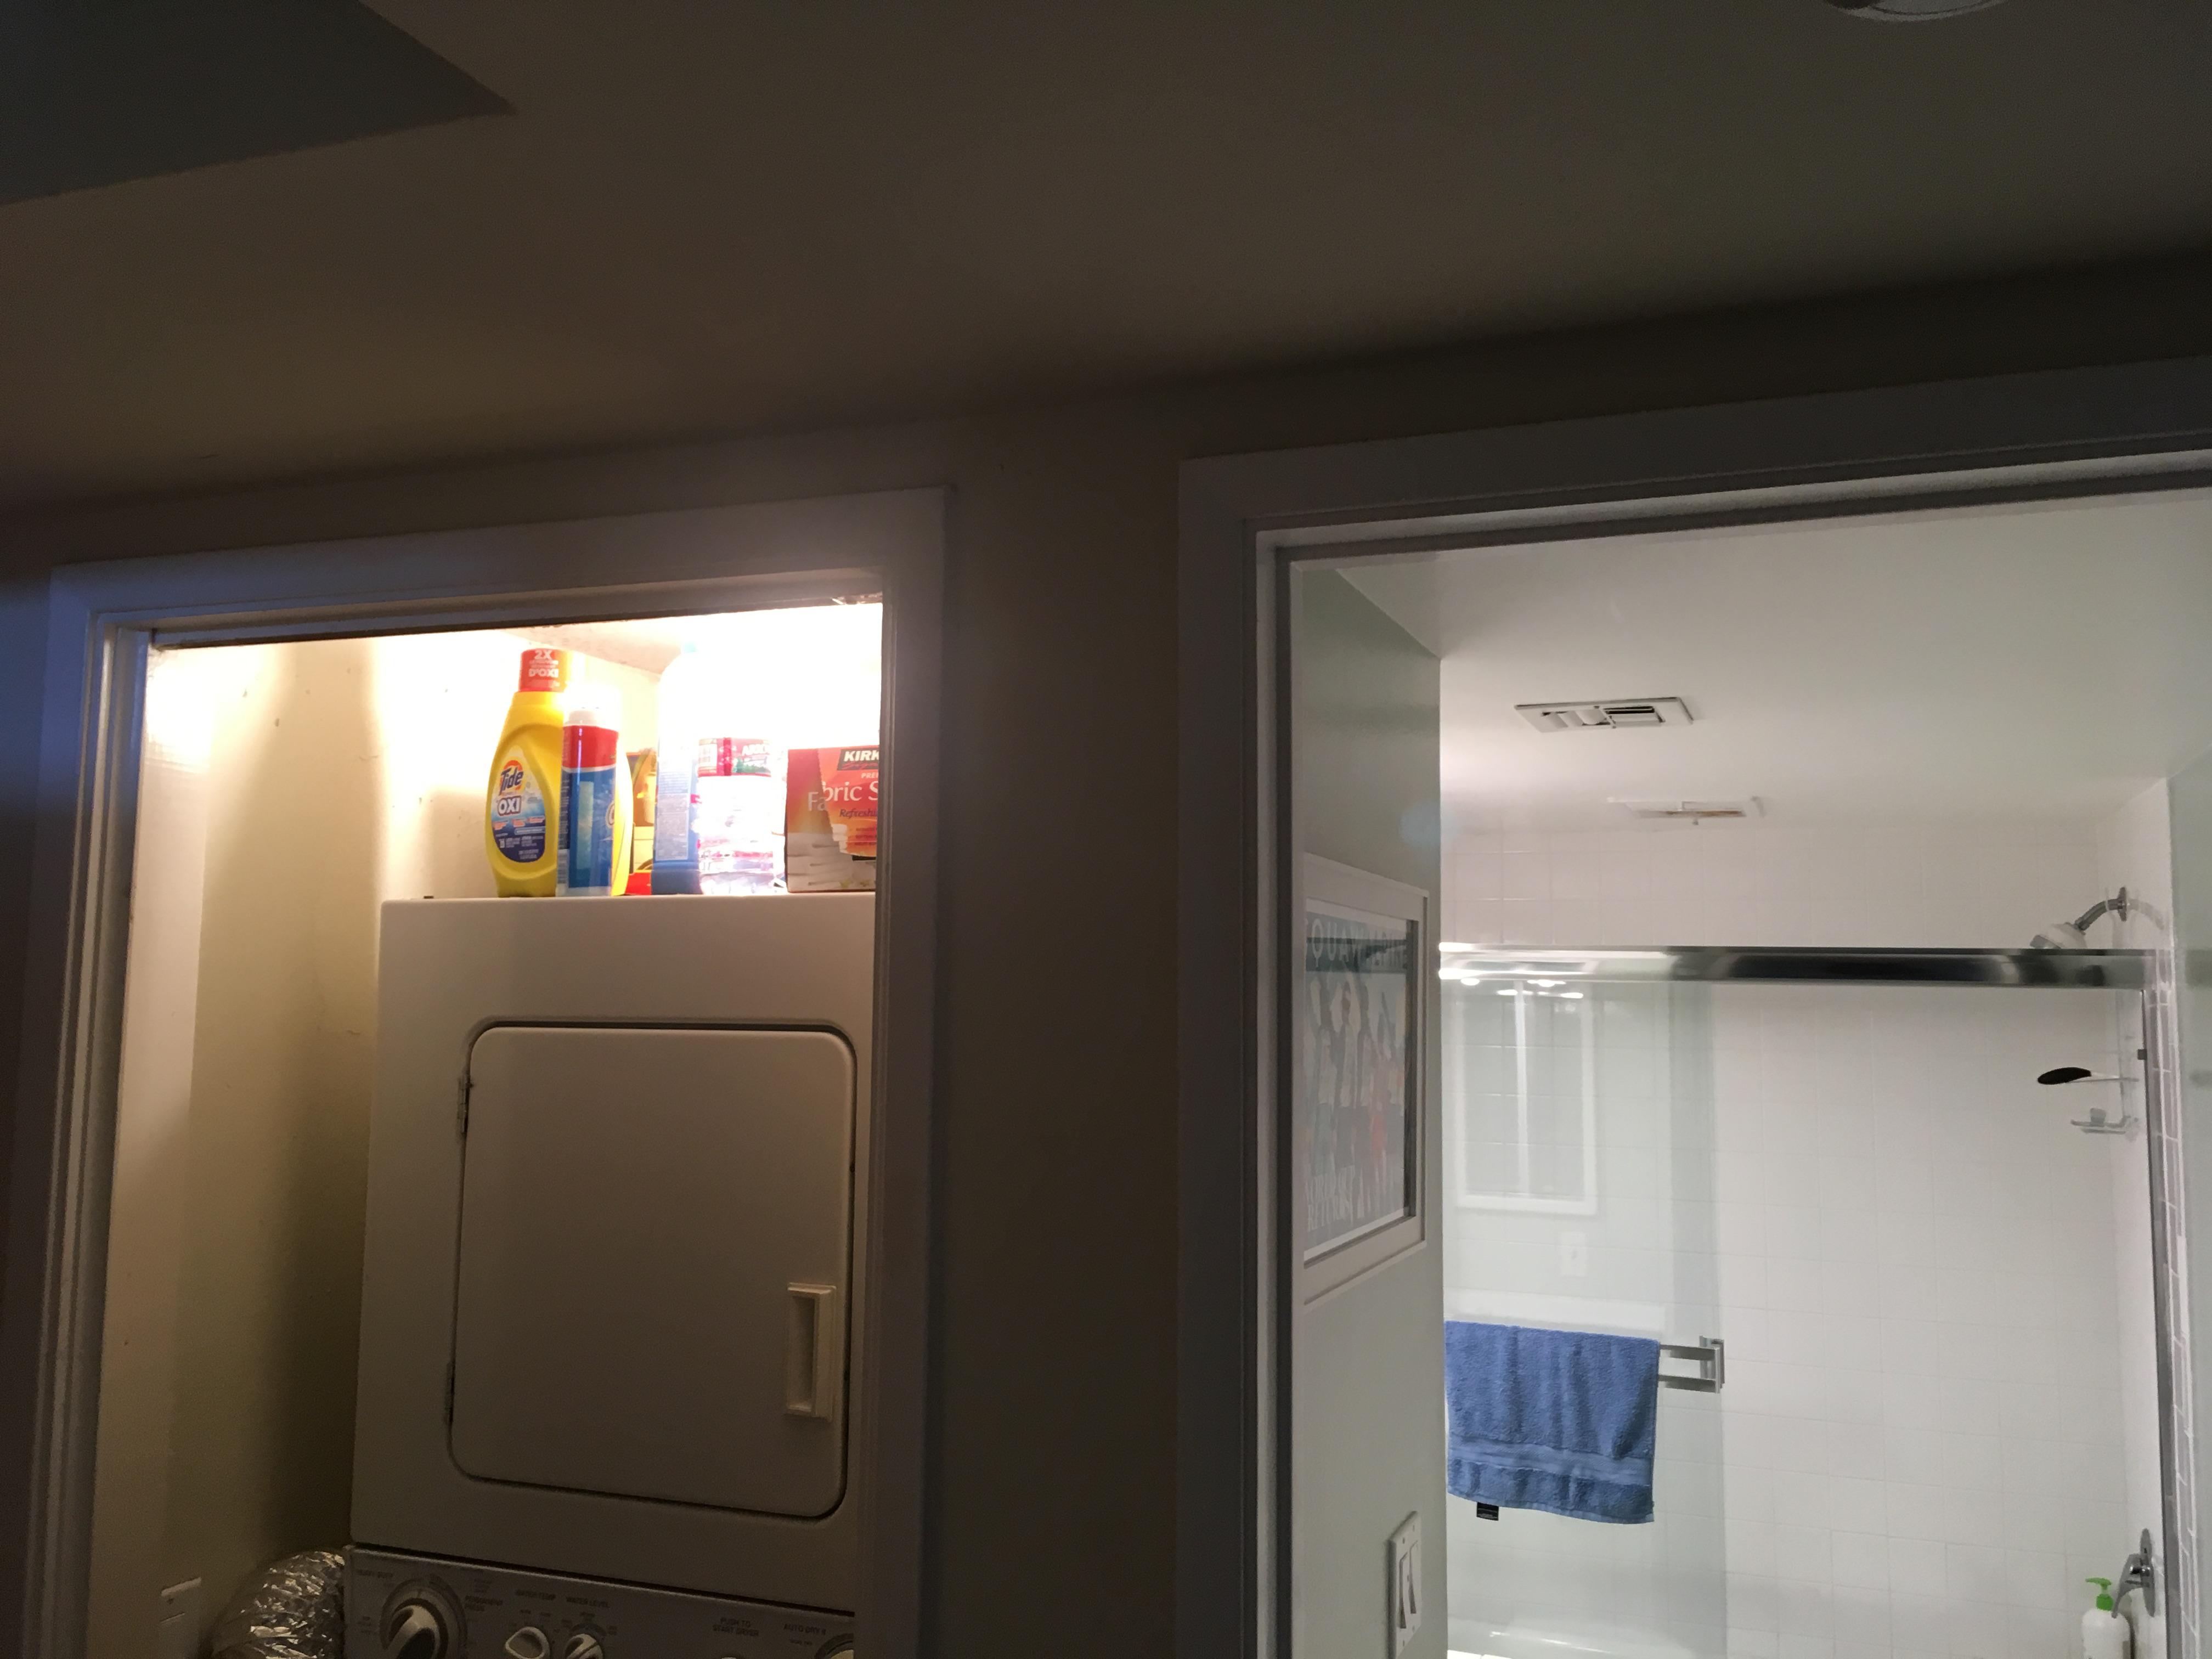 Running an exhaust duct in existing condo inbetween floors - help?-img-6595.jpg